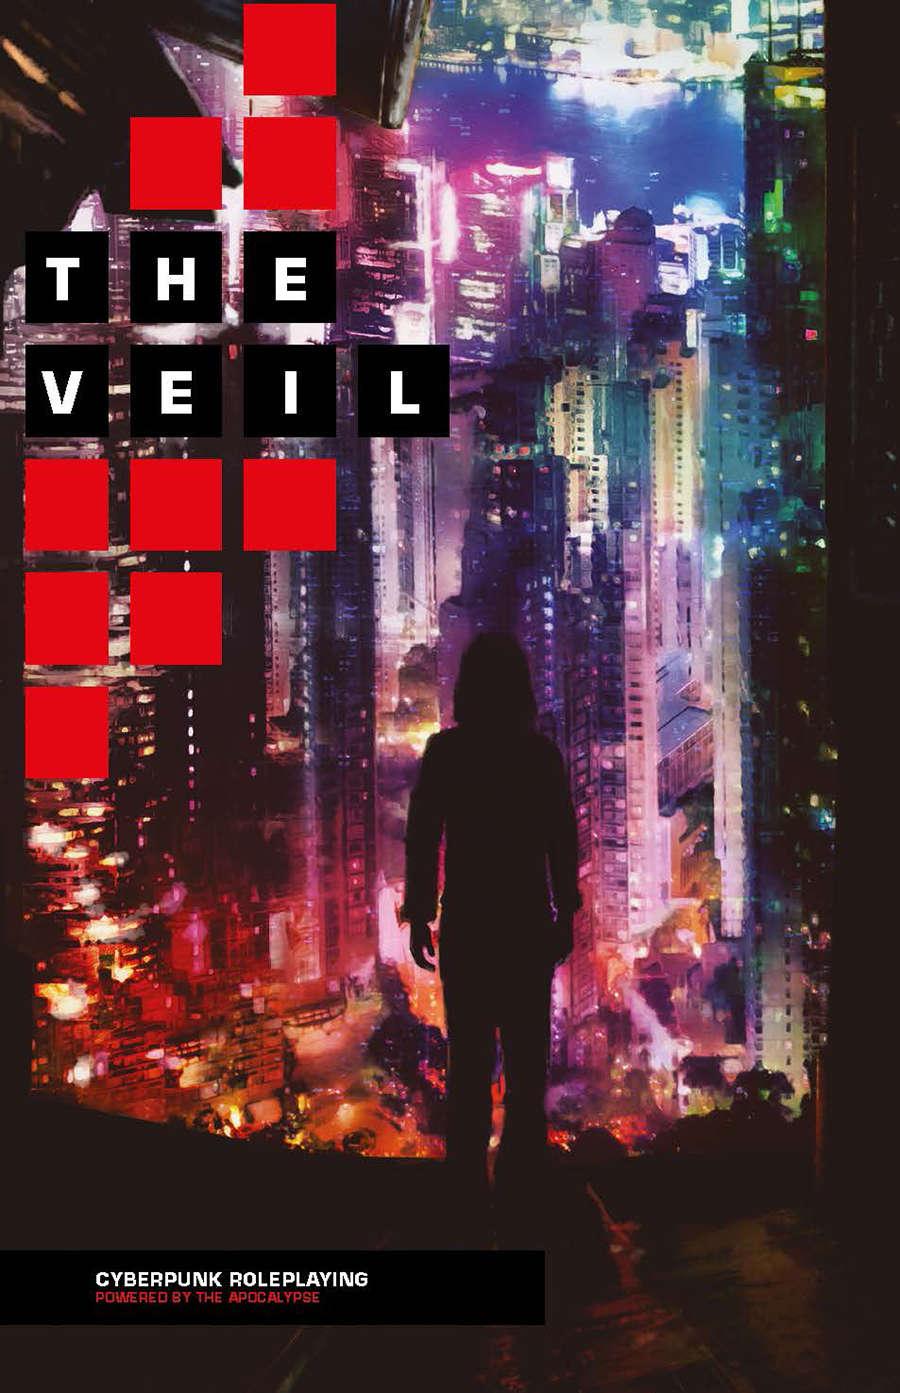 The Veil: Cyberpunk Roleplaying Powered by the Apocalypse - Samjoko  Publishing   DriveThruRPG com